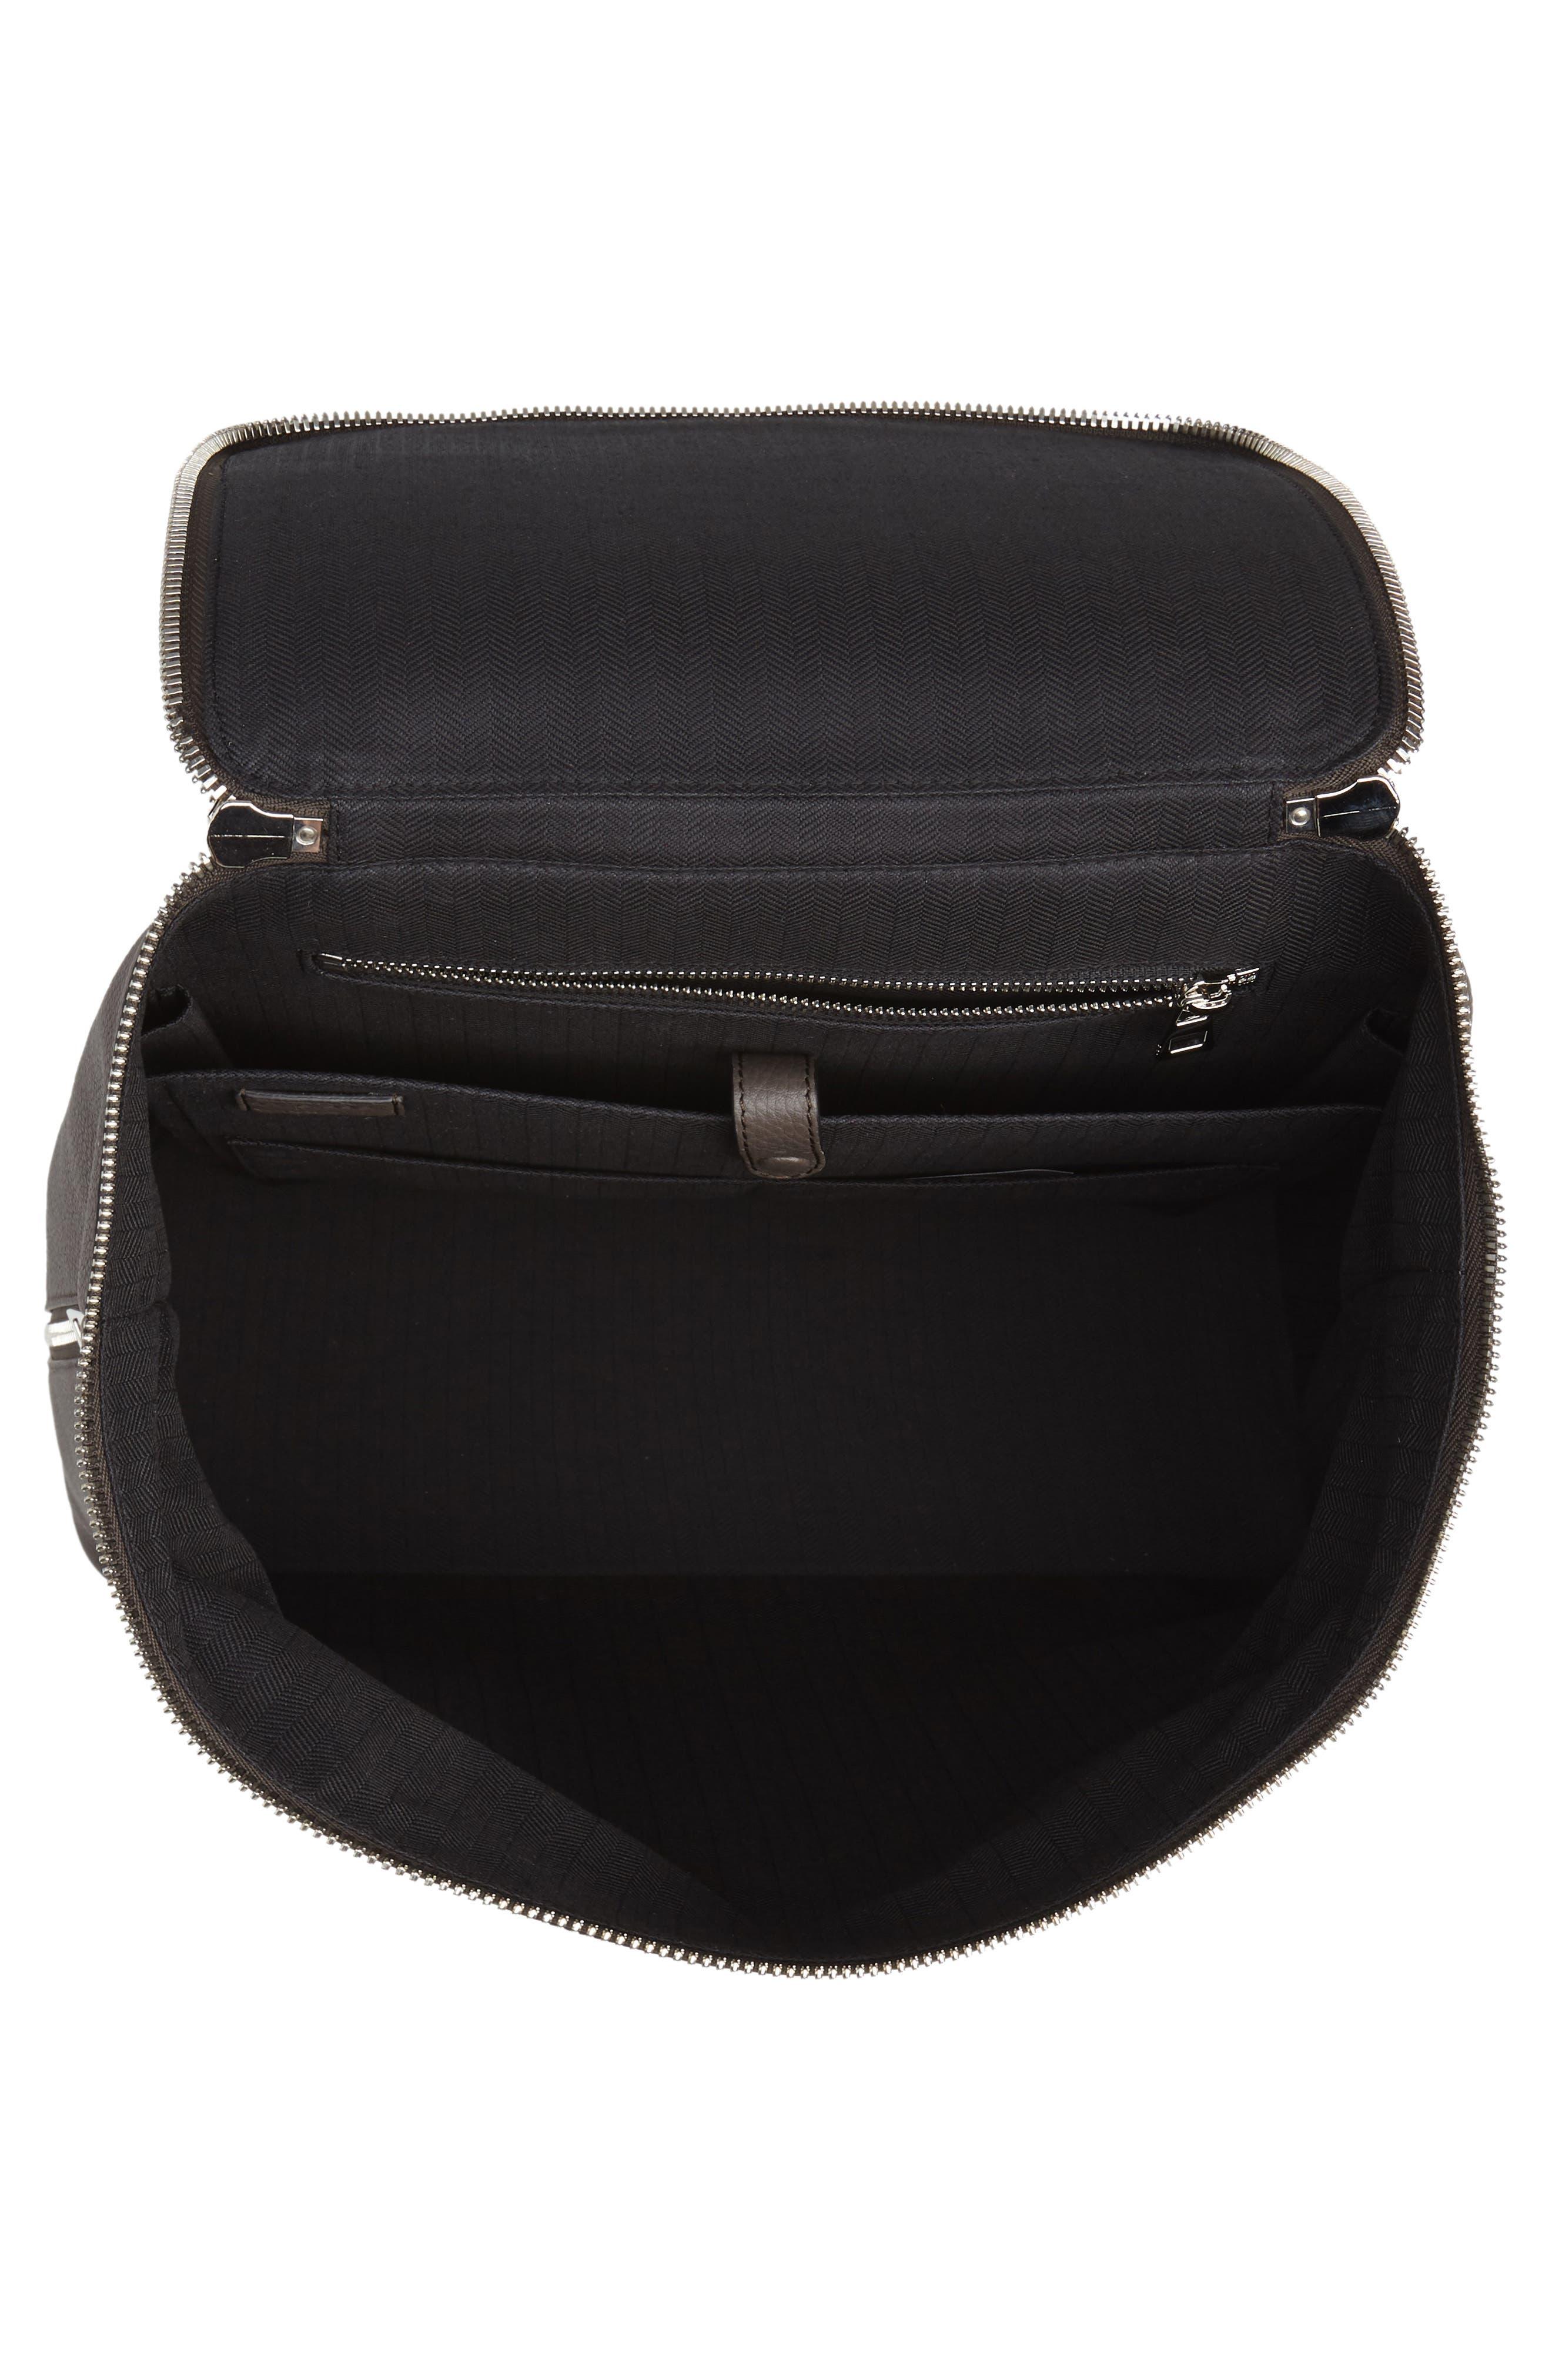 Goya Plaid Calfskin Leather Backpack,                             Alternate thumbnail 4, color,                             022